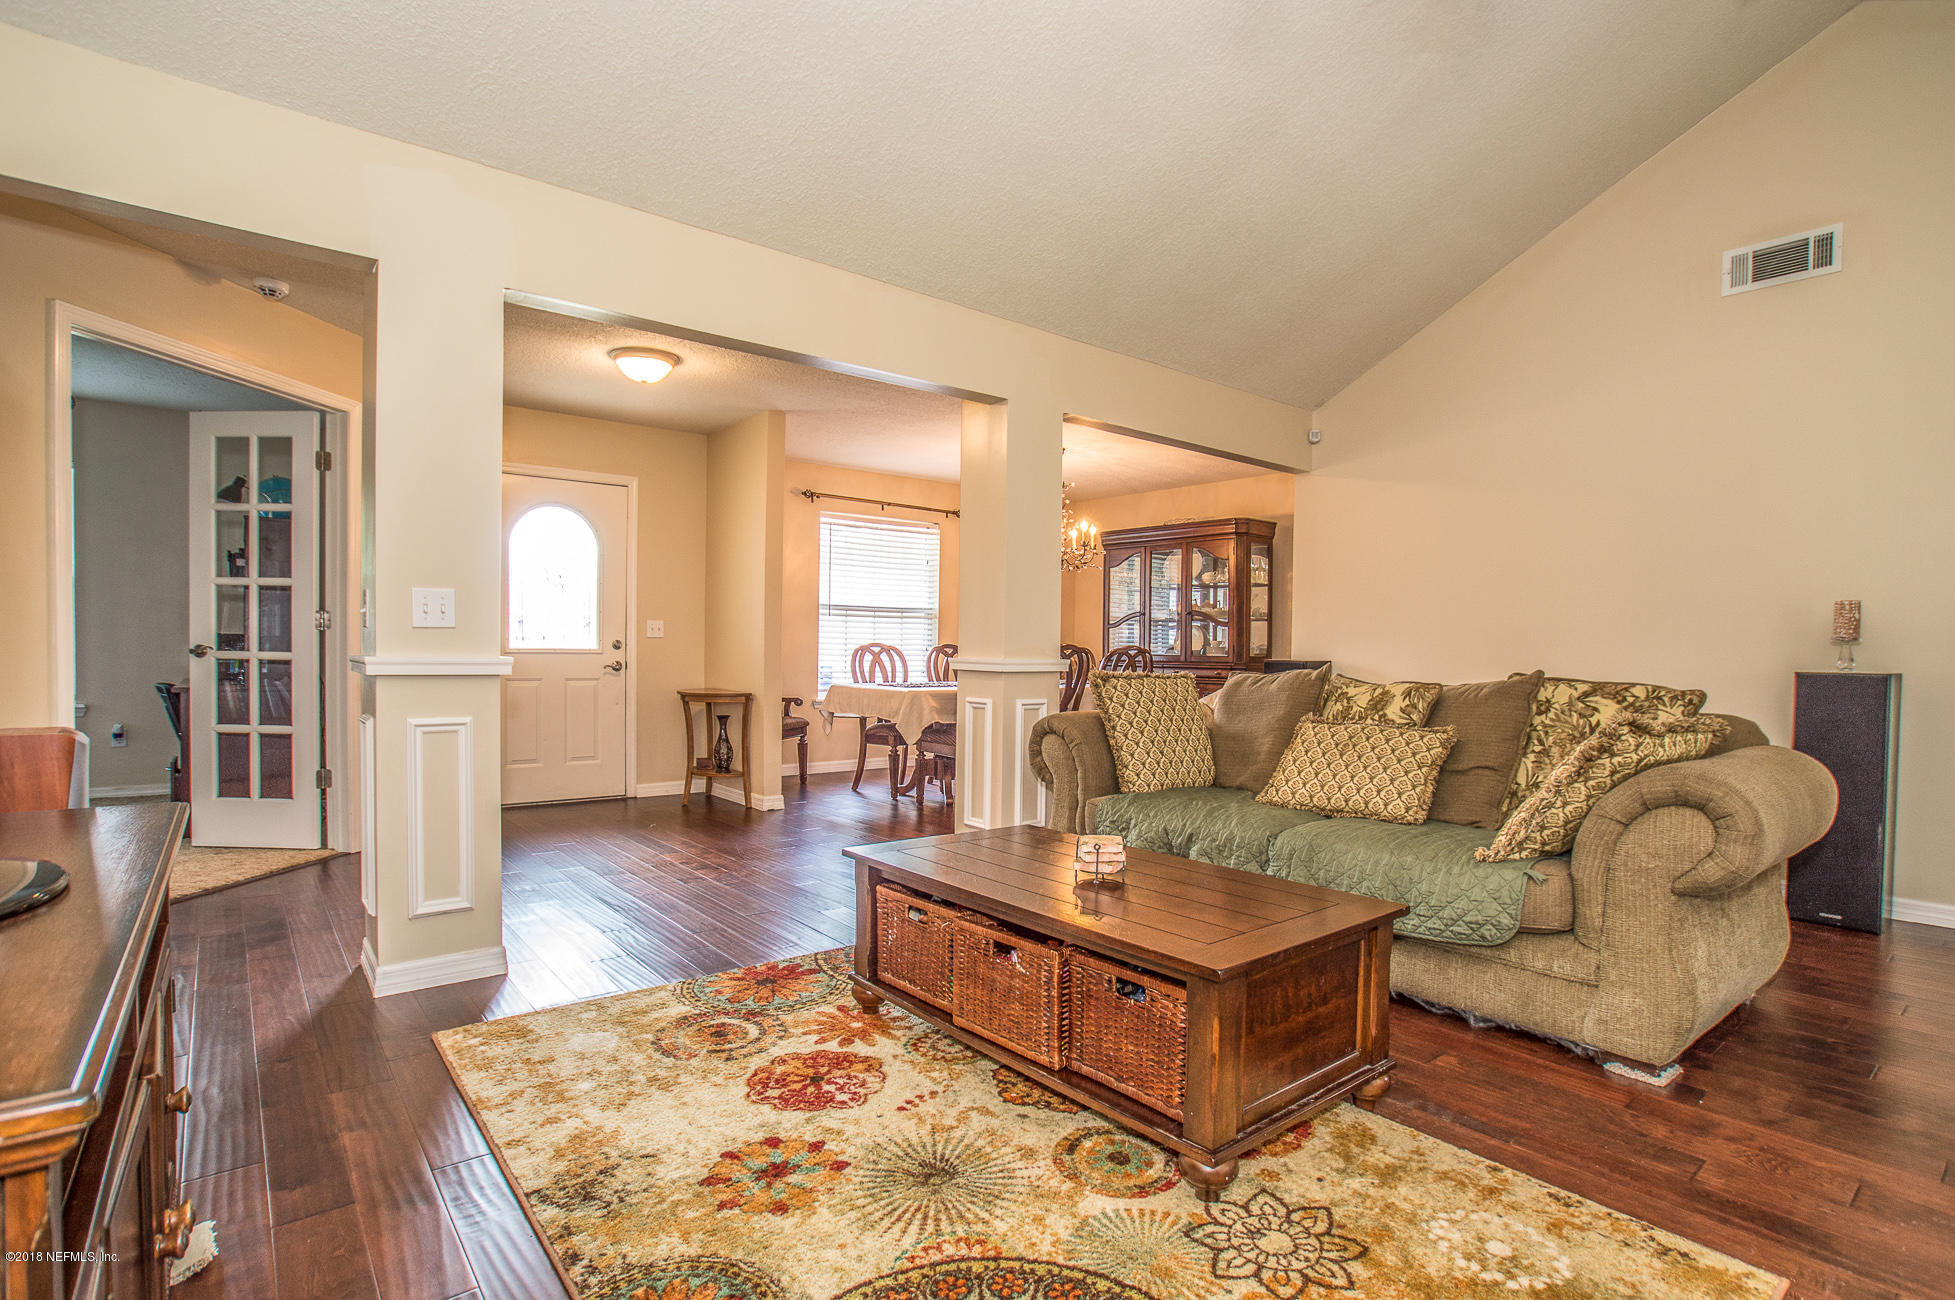 8421 GATEPOST, JACKSONVILLE, FLORIDA 32244, 4 Bedrooms Bedrooms, ,2 BathroomsBathrooms,Residential - single family,For sale,GATEPOST,940235